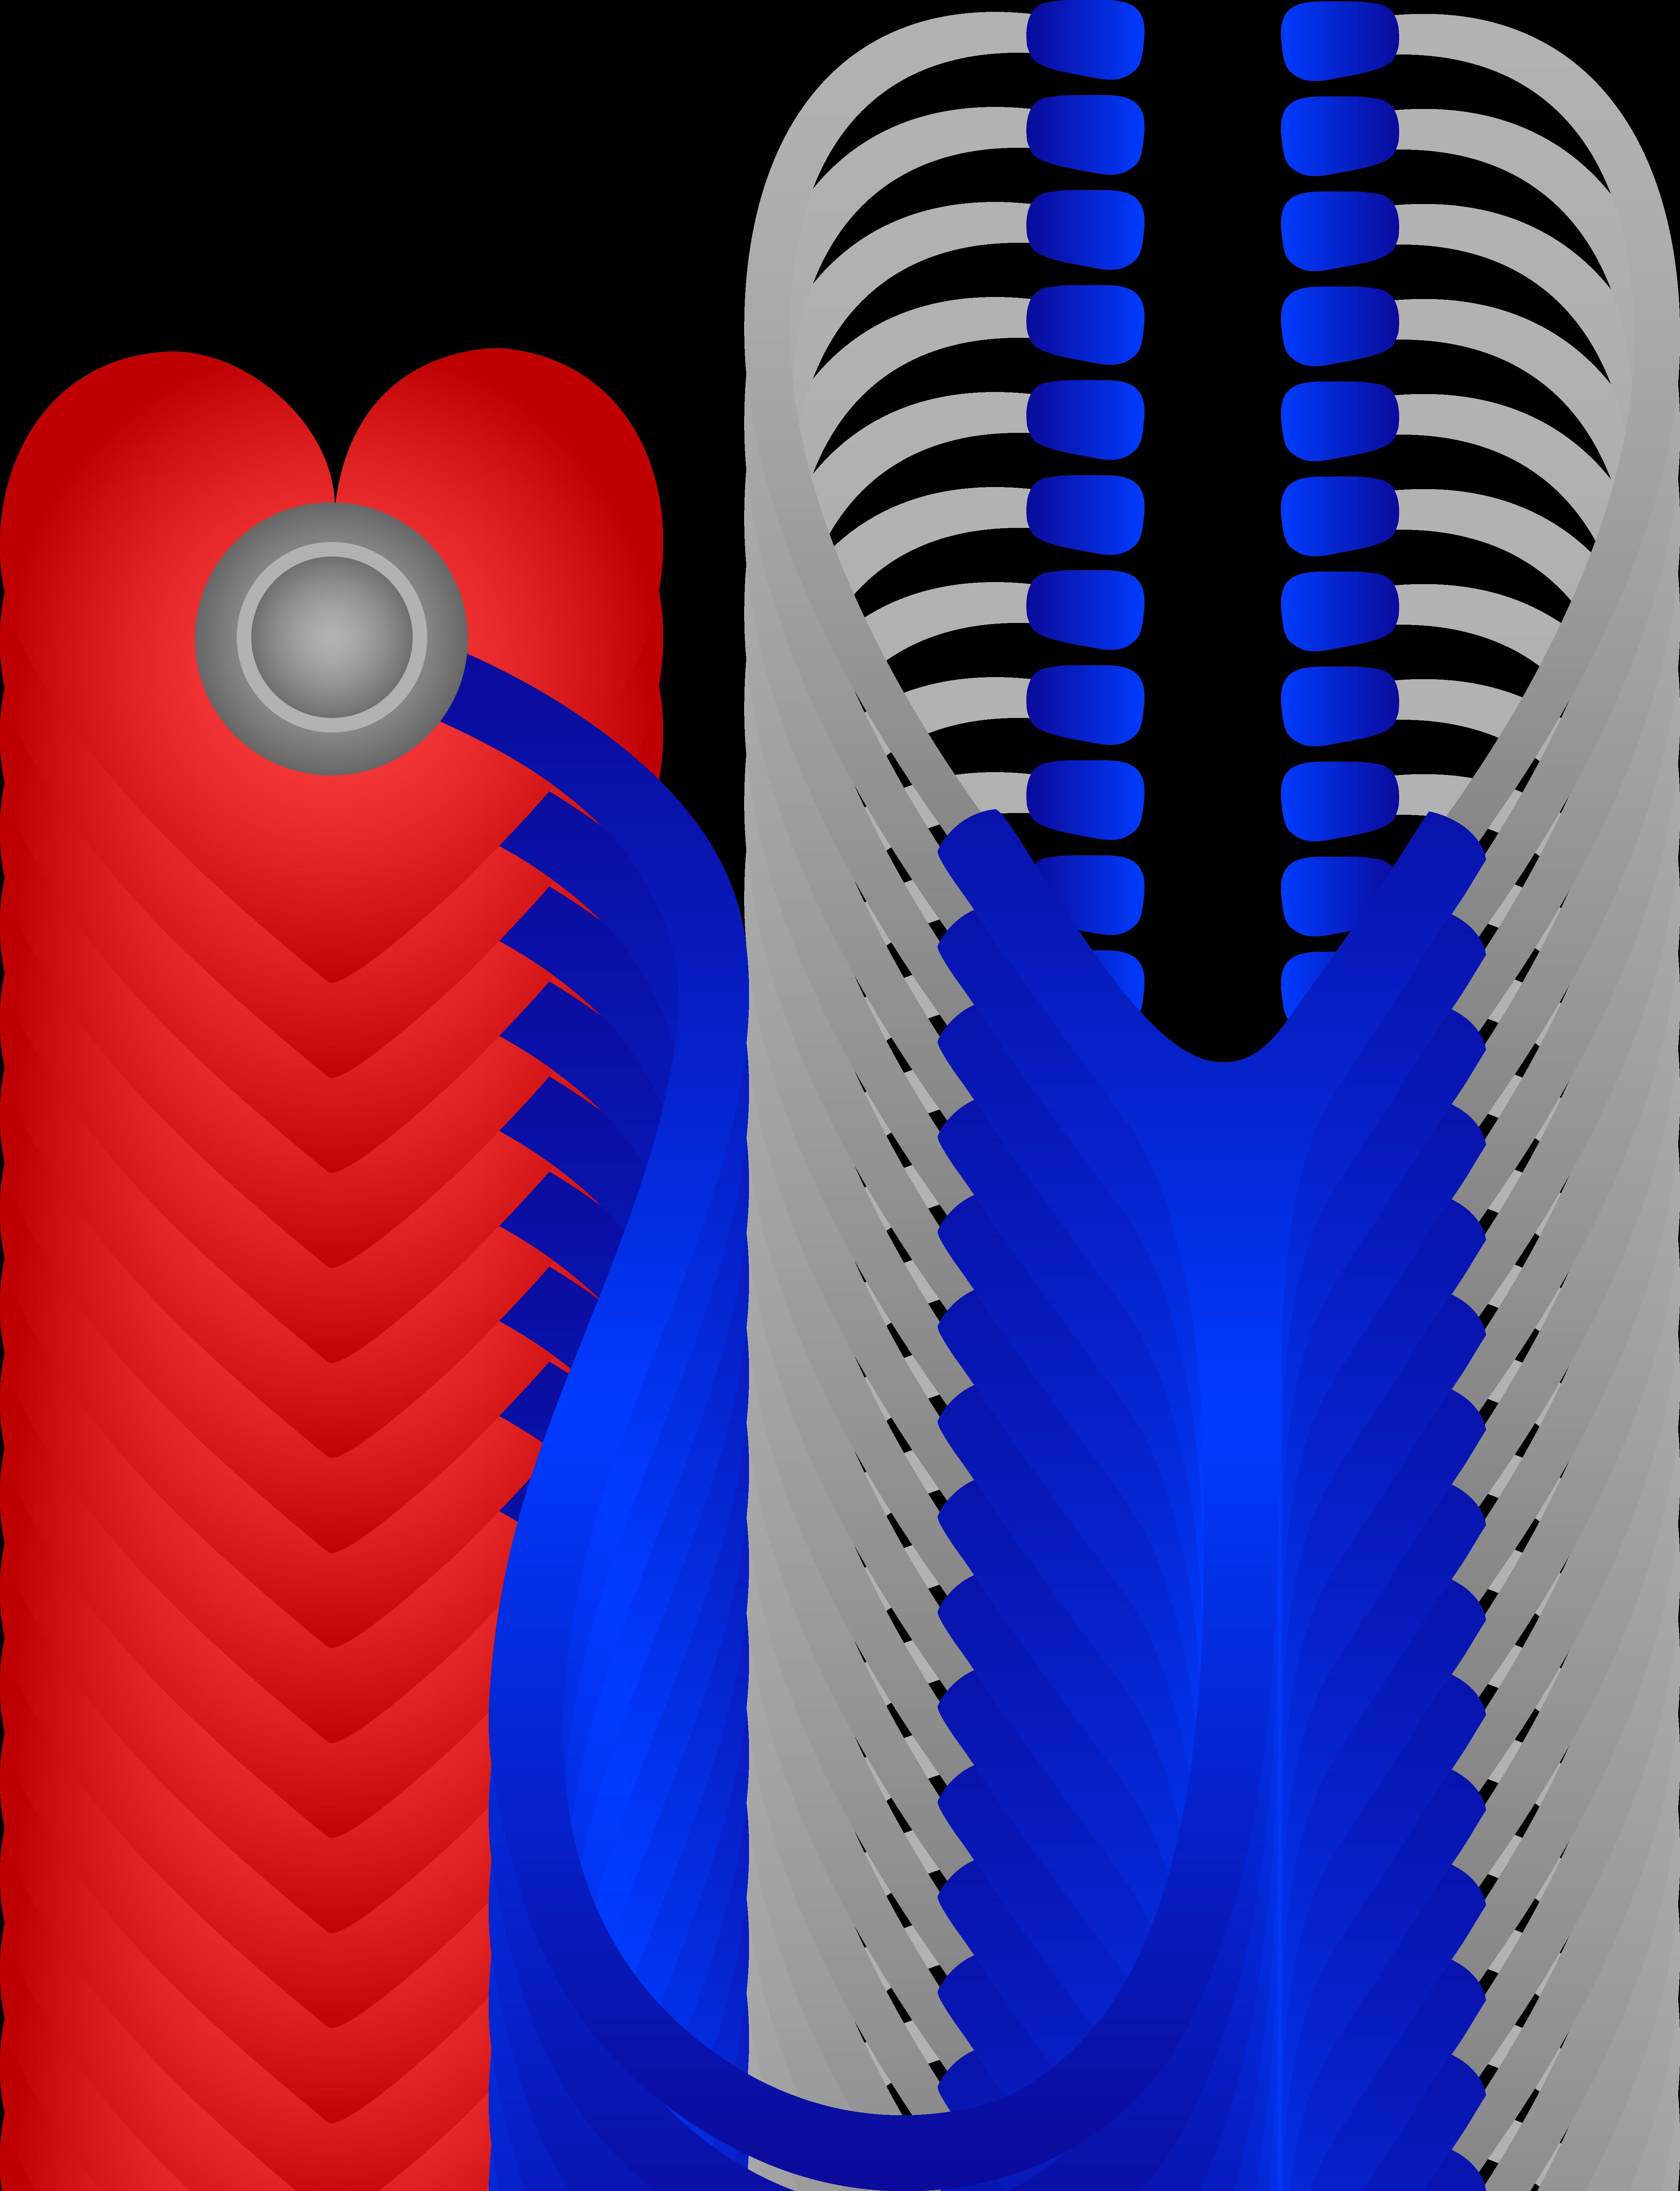 Stethoscope heart. Listening to beat free